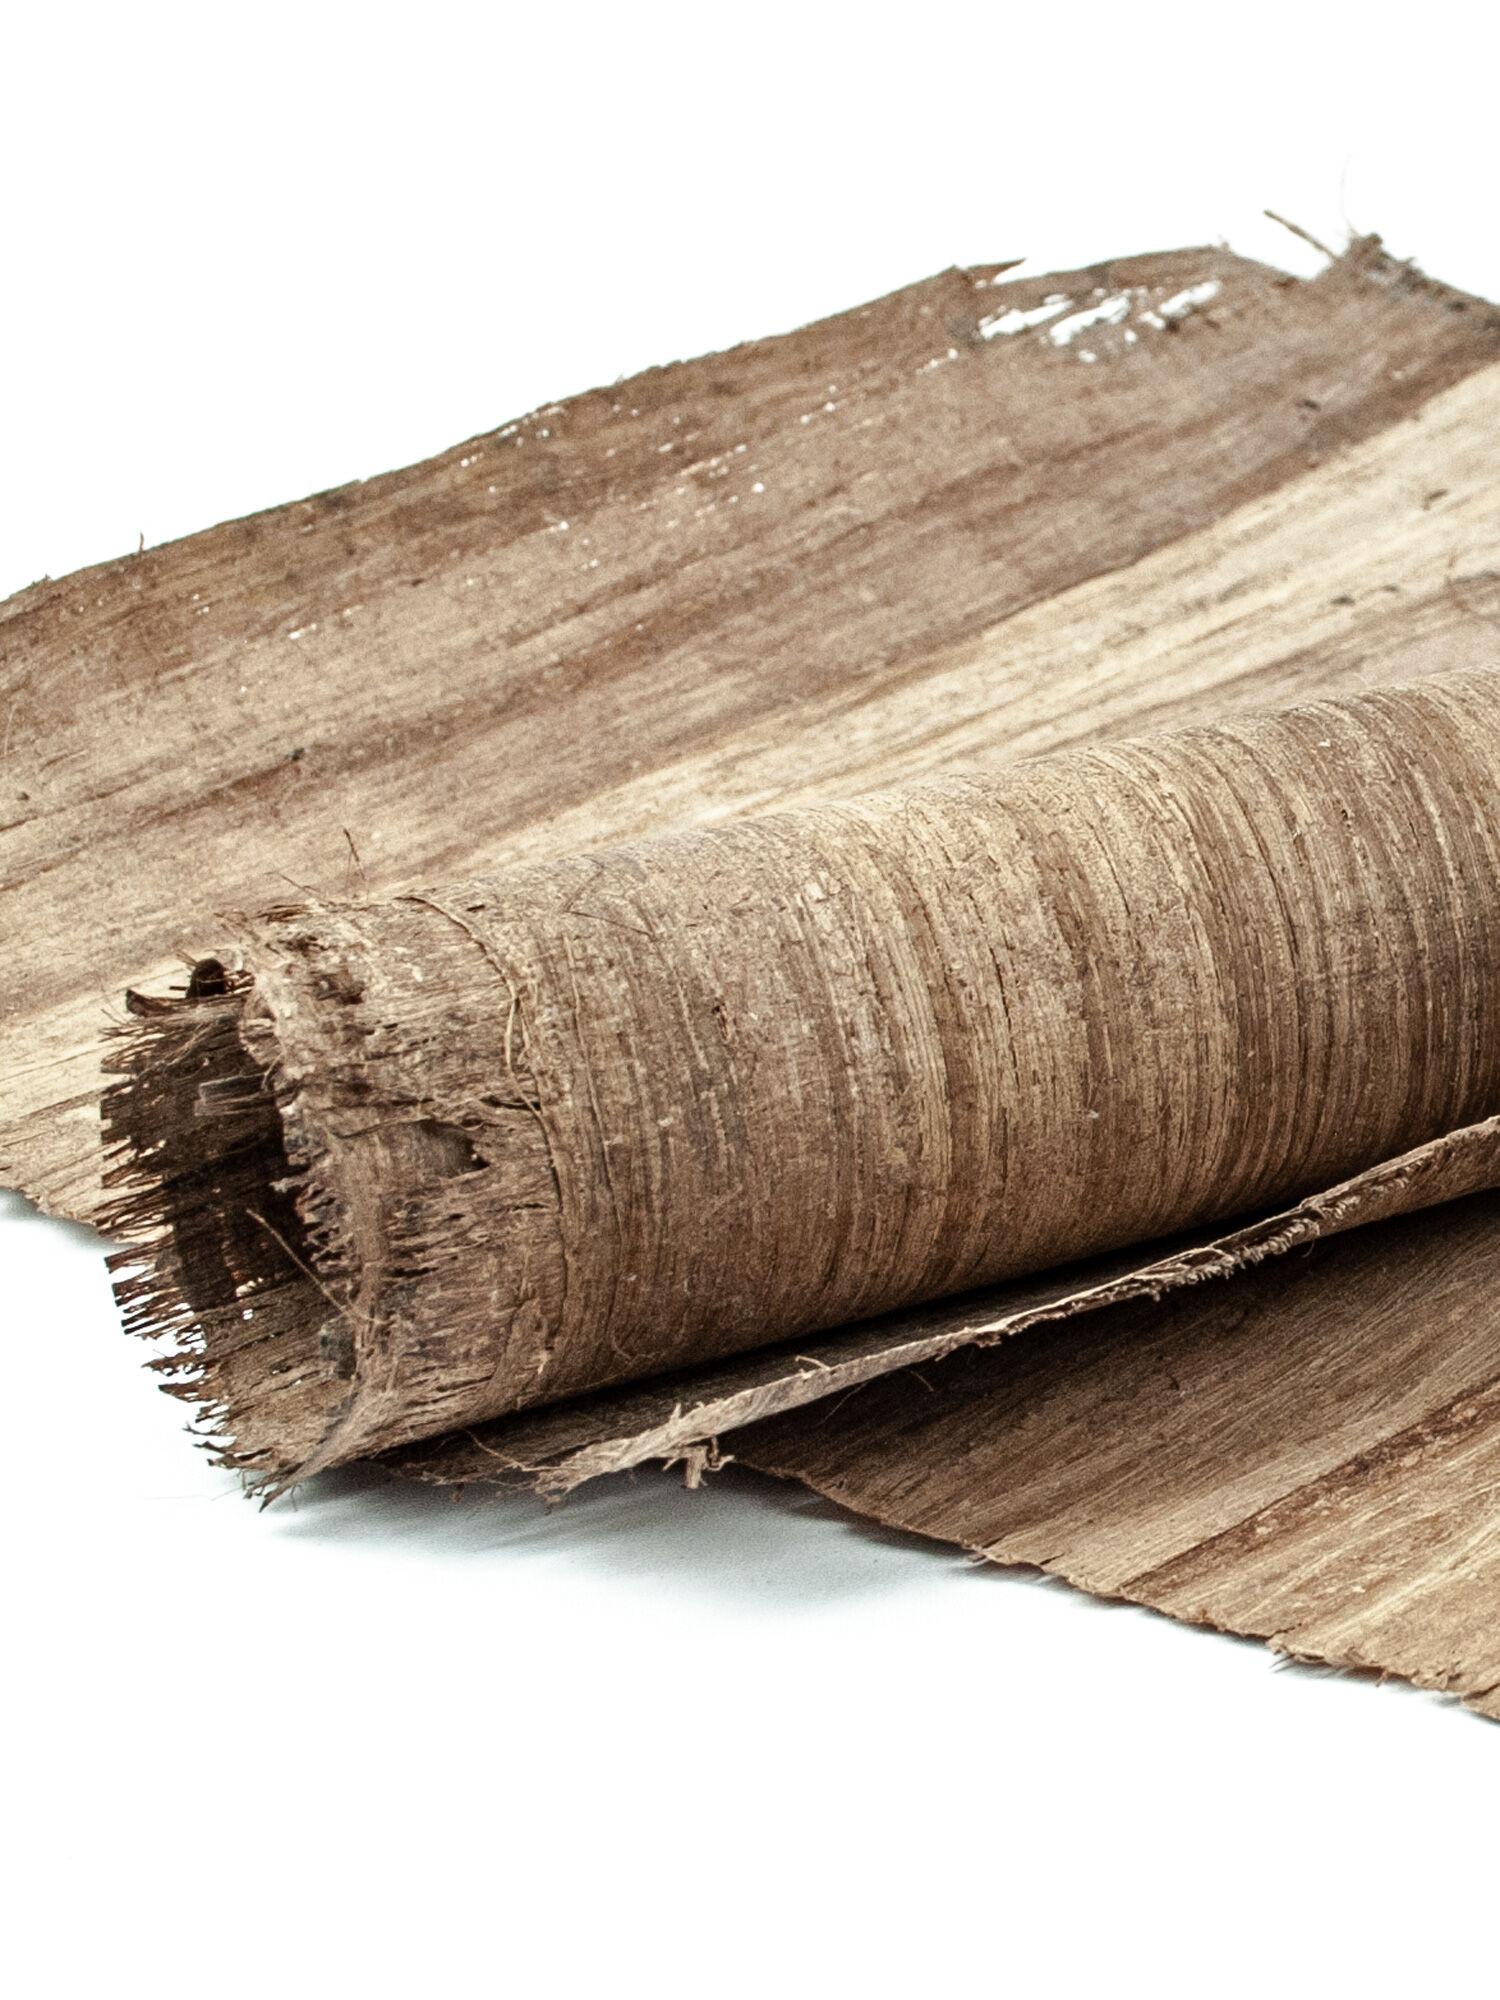 antik papyrus blatt kaufen echter gypten papyri r mer. Black Bedroom Furniture Sets. Home Design Ideas